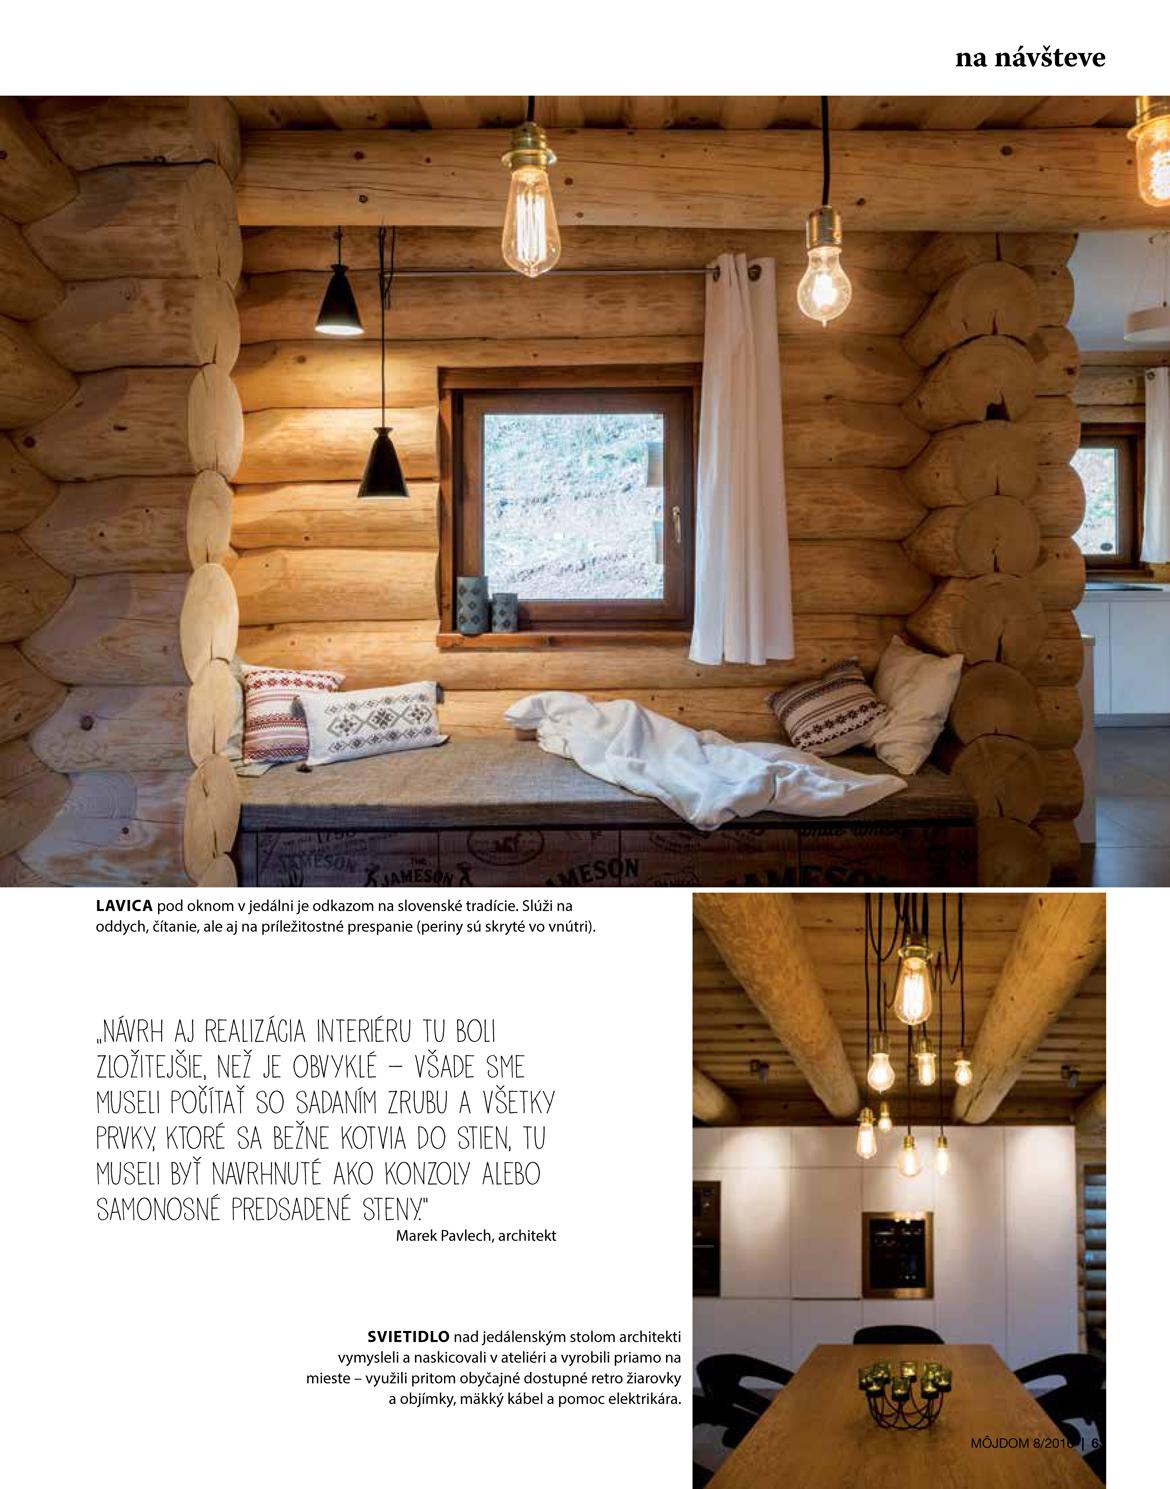 008-interier-zrub-tale-mojdom-pavlech-architekti